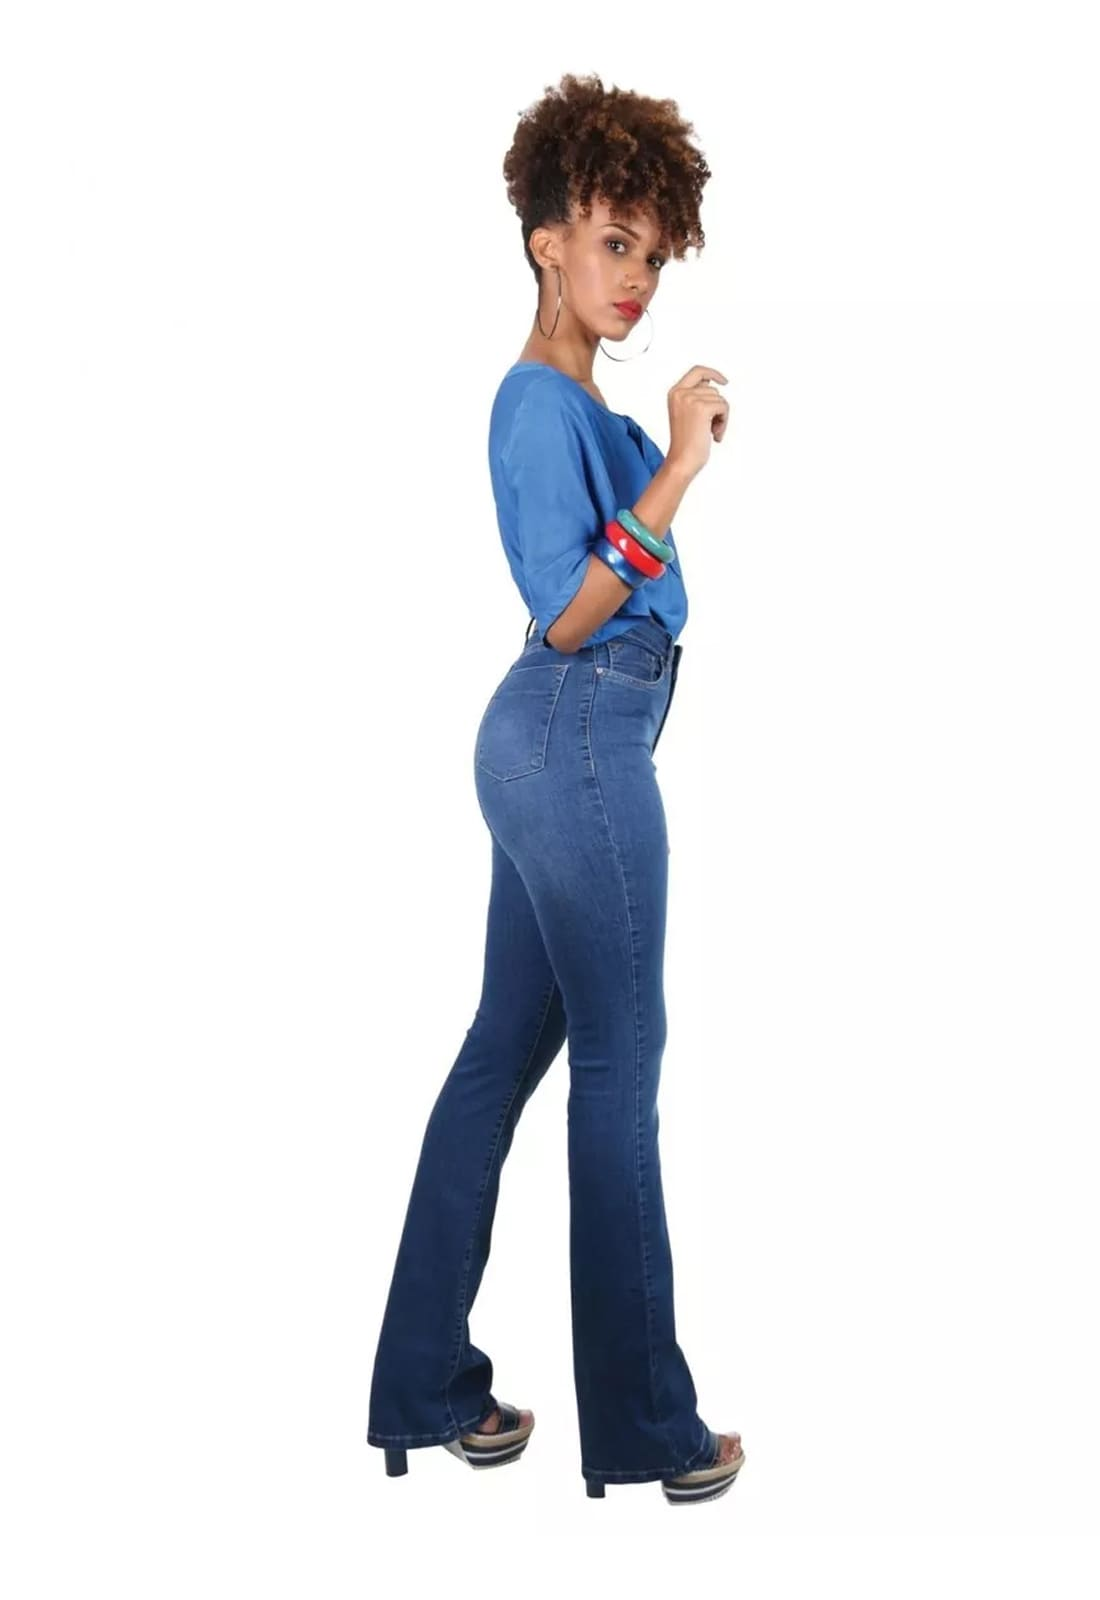 Calça Jeans Feminina Tradicional Flare